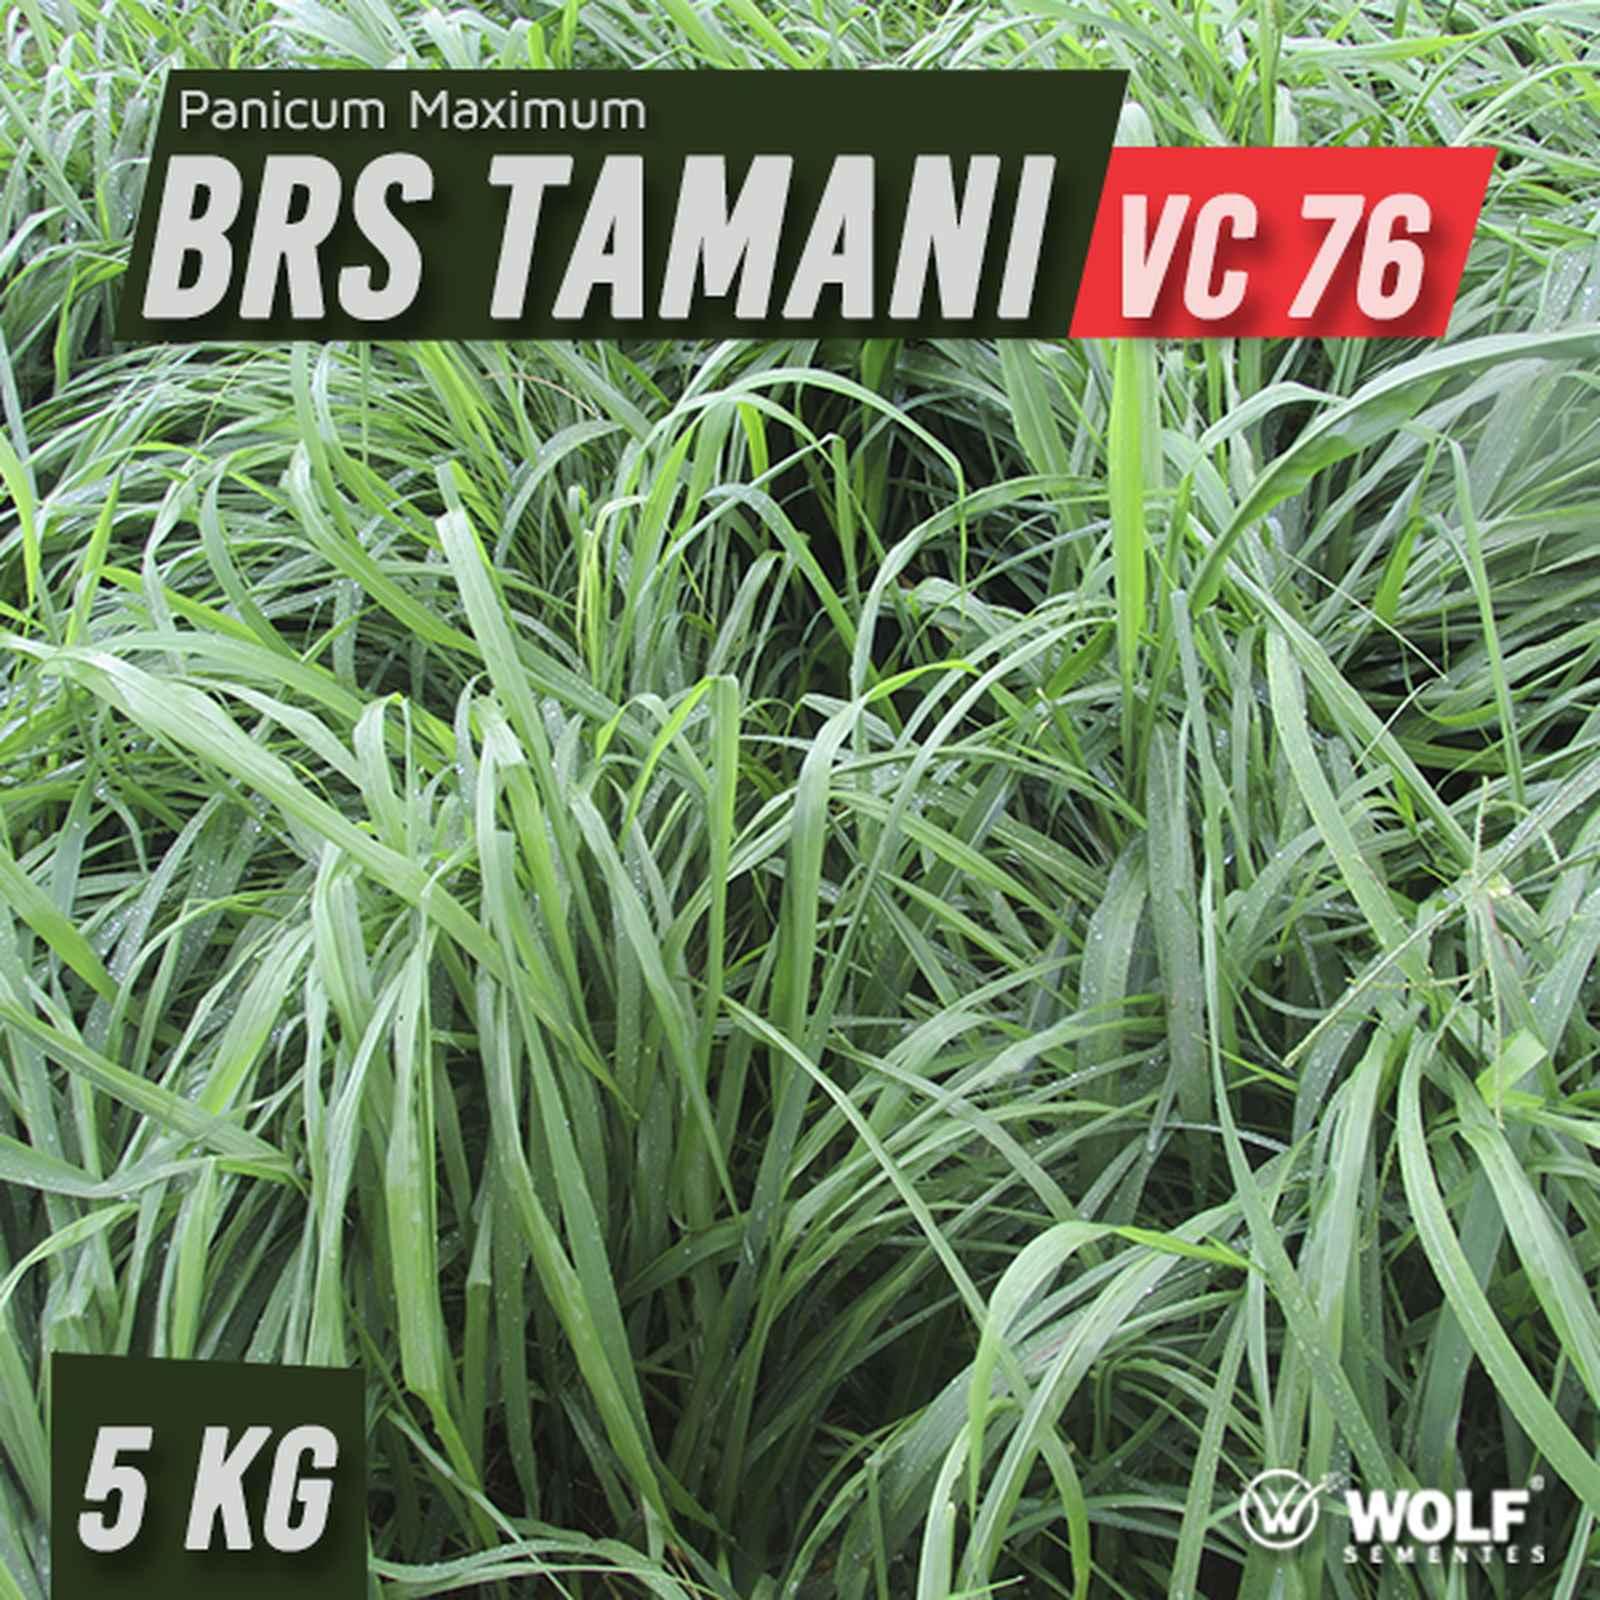 Sementes para Capim BRS TAMANI VC76 (Saco de 5kg)